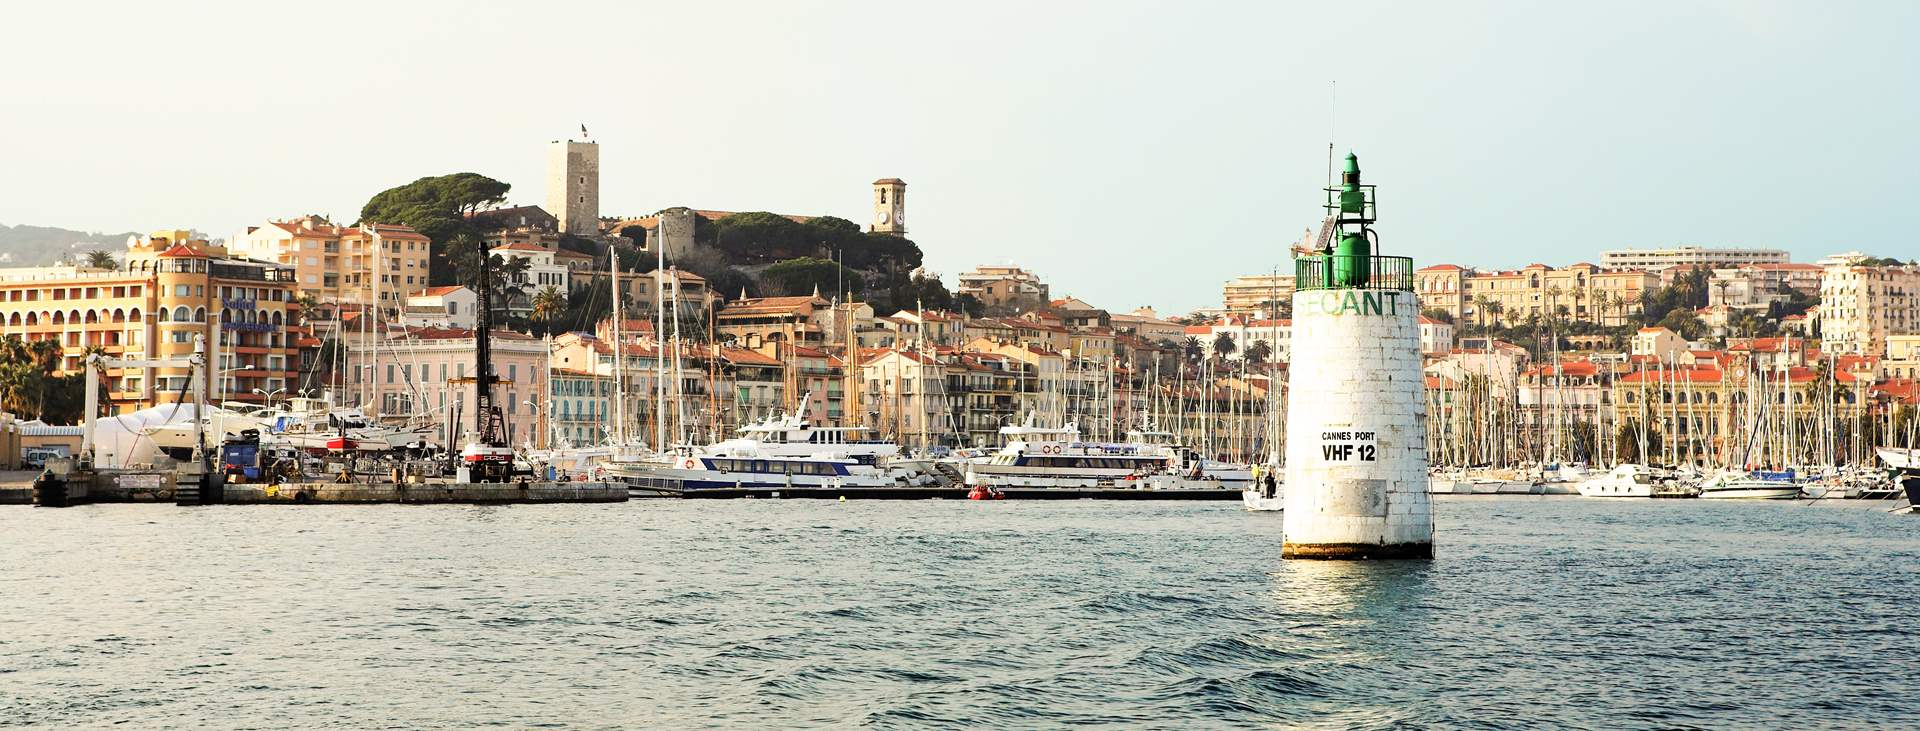 Boka din resa till Cannes i Frankrike